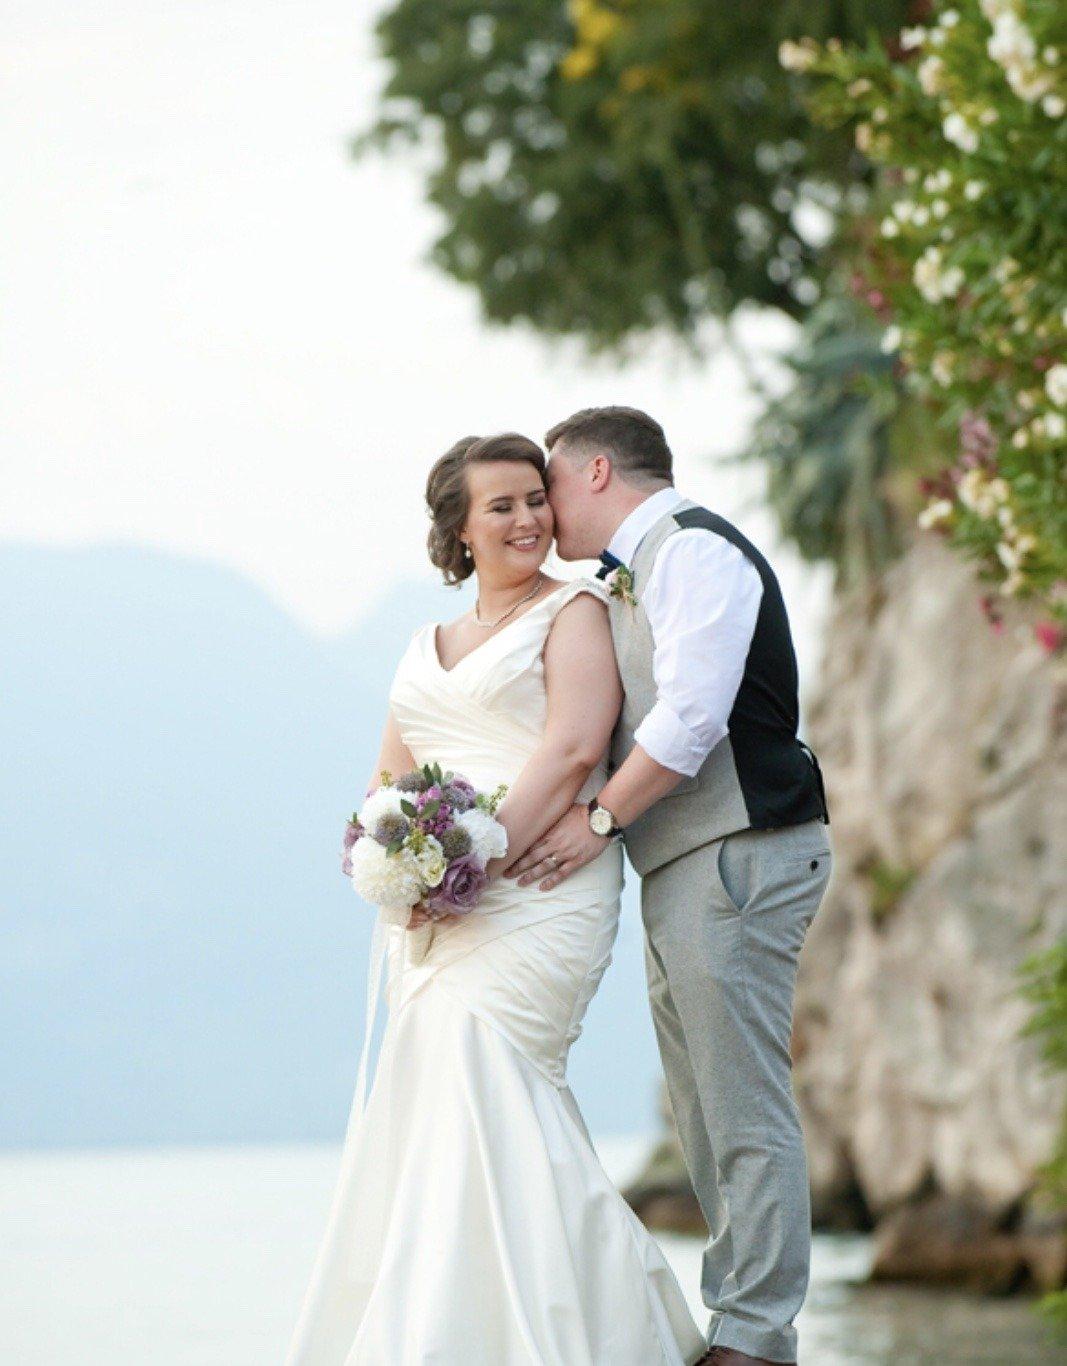 Patricia & John's Lake Garda wedding – Malcesine